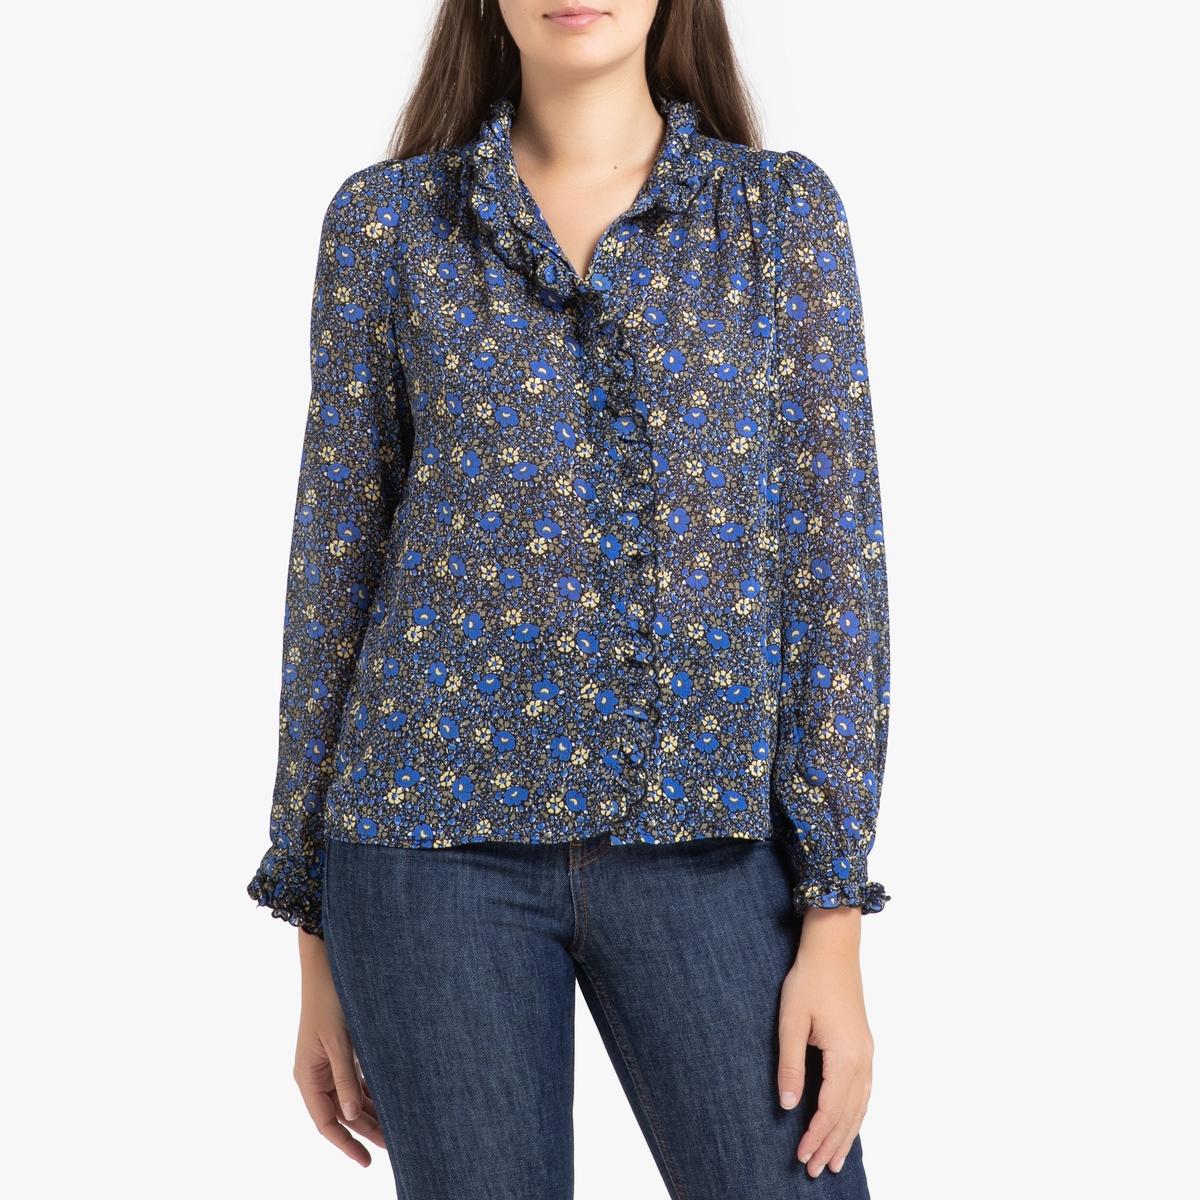 купить Рубашка La Redoute С длинными рукавами CHAN XS синий по цене 7799 рублей